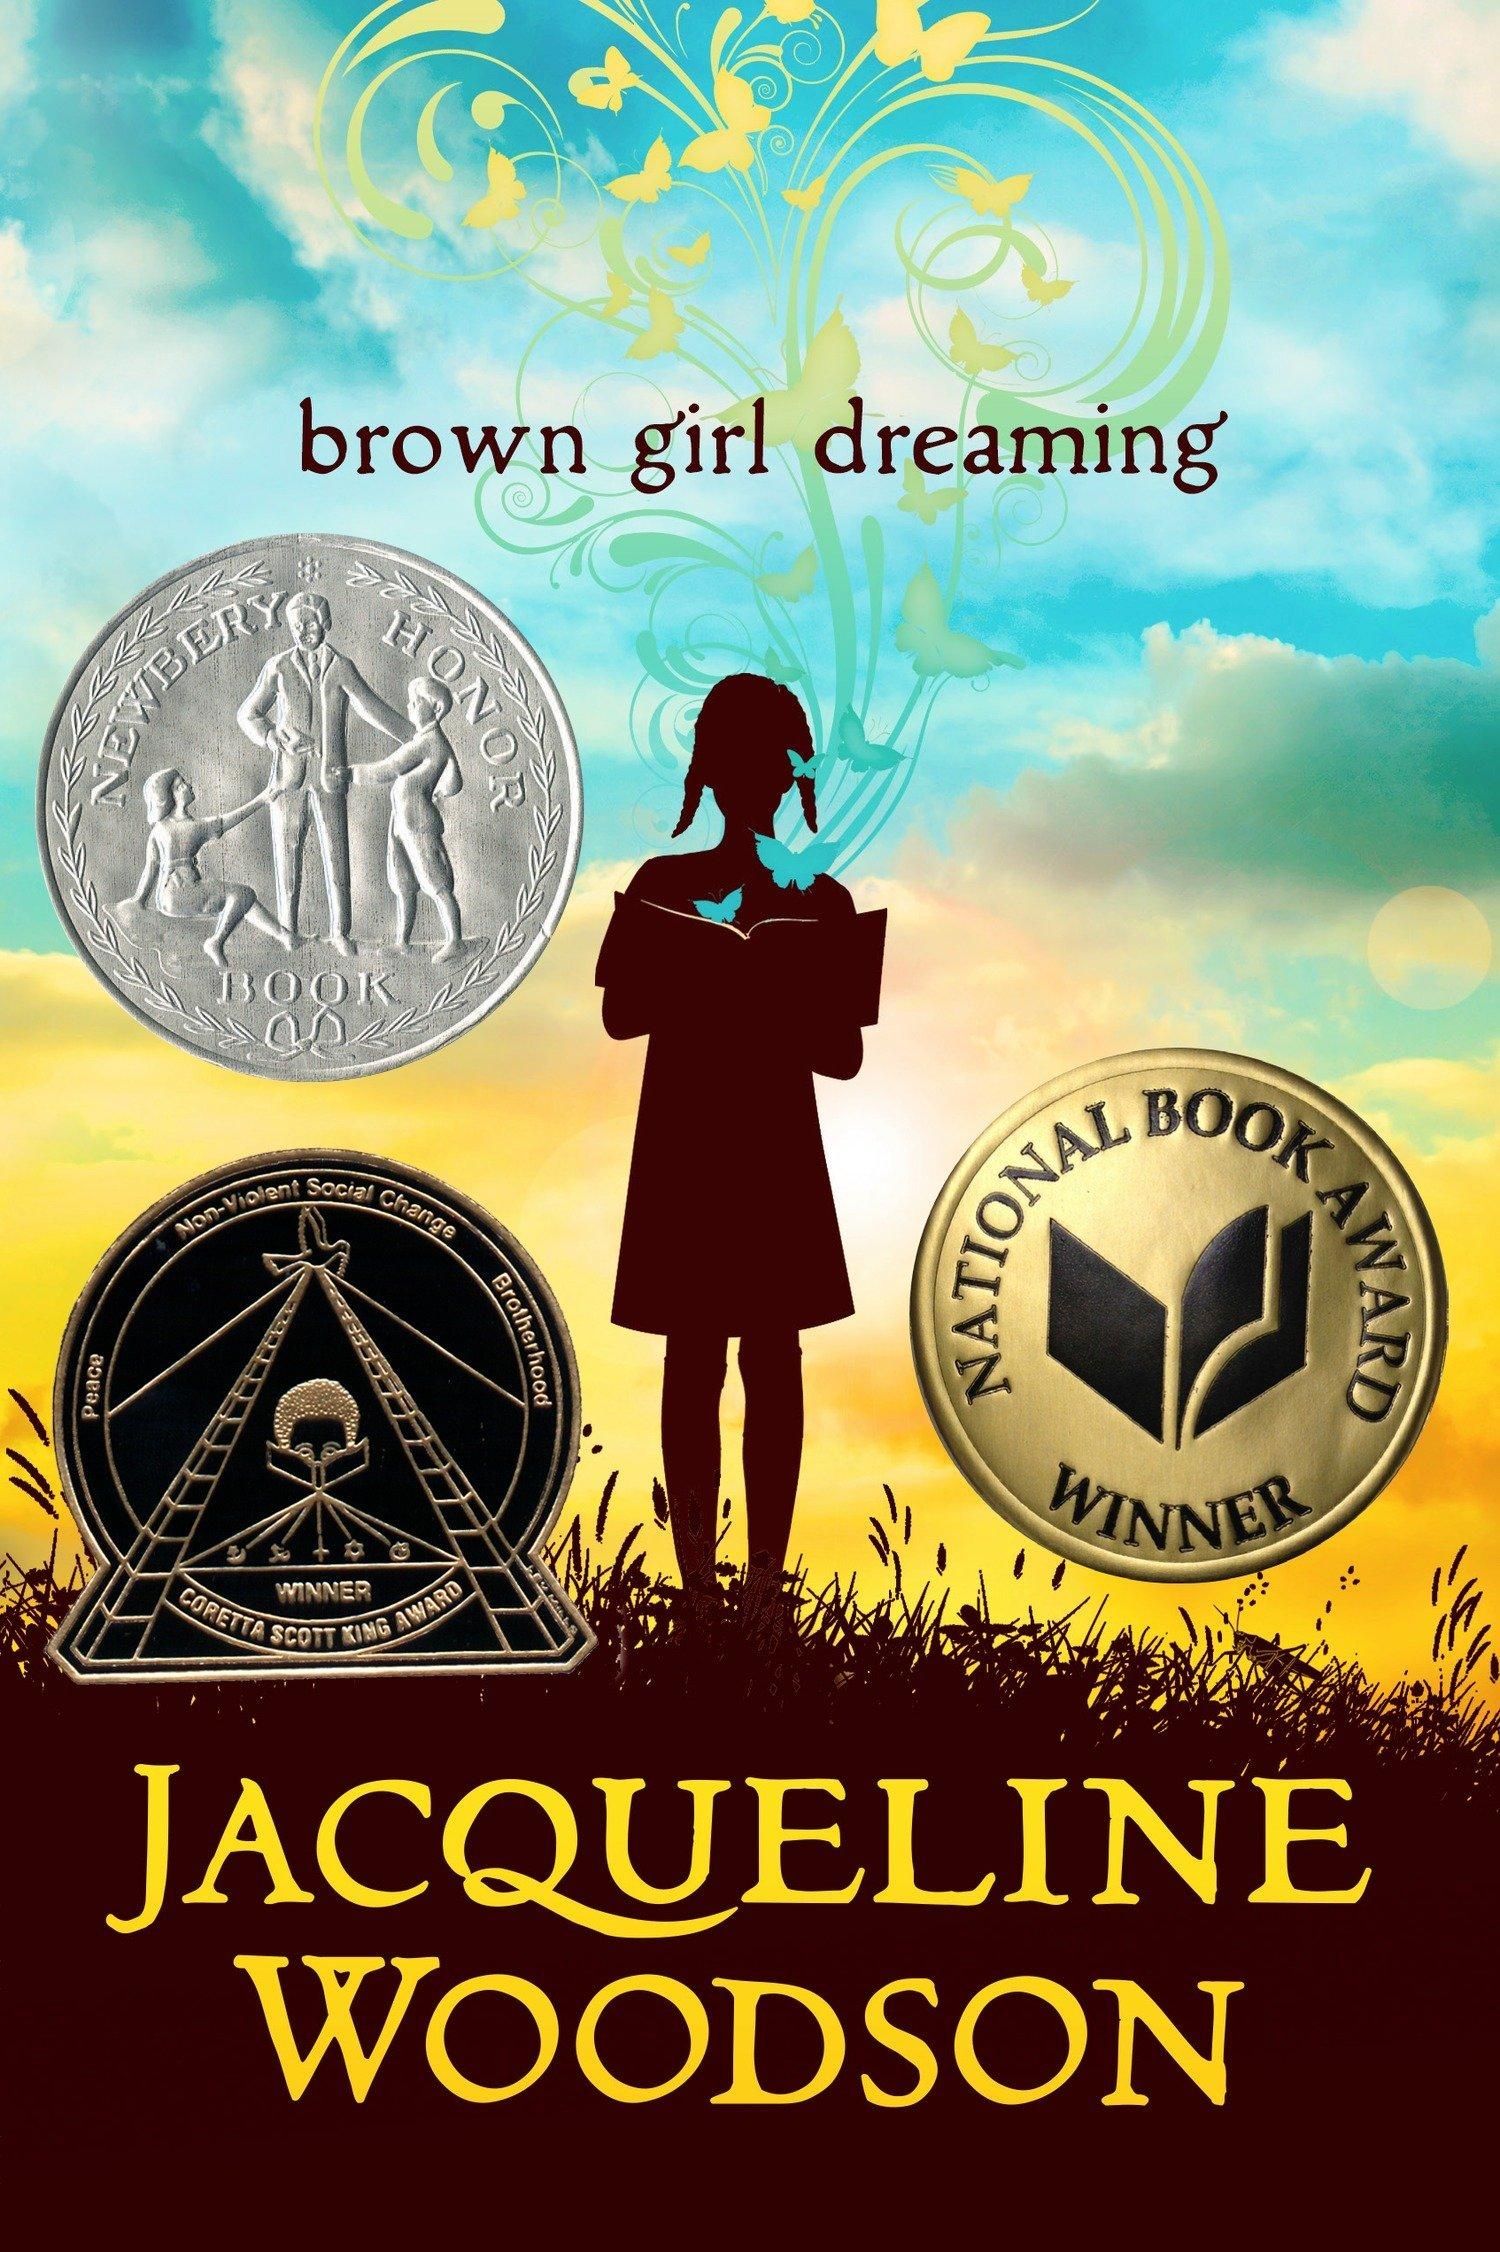 Brown Girl Dreaming (Newbery Honor Book): Amazon.es: Jacqueline Woodson: Libros en idiomas extranjeros